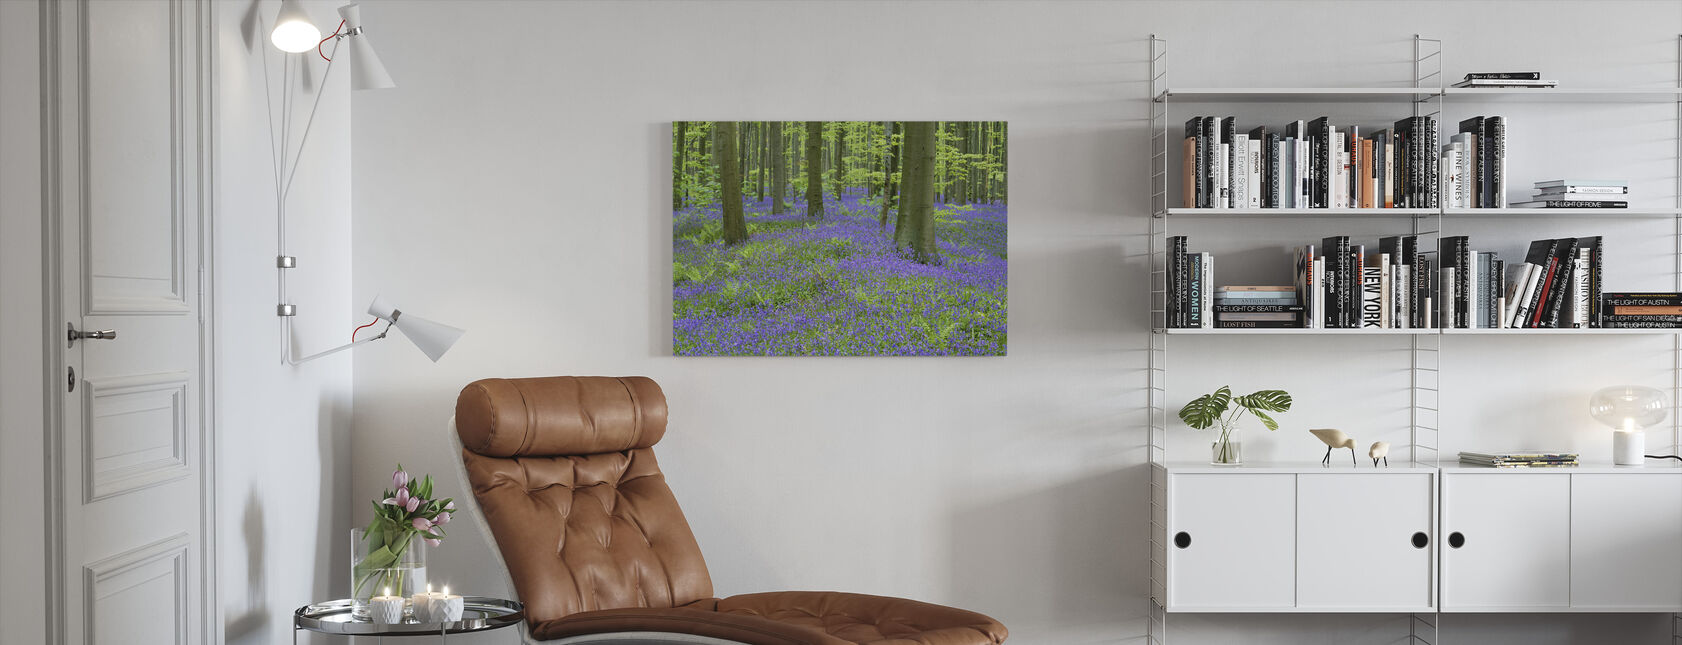 Bluebells Behang - Canvas print - Woonkamer